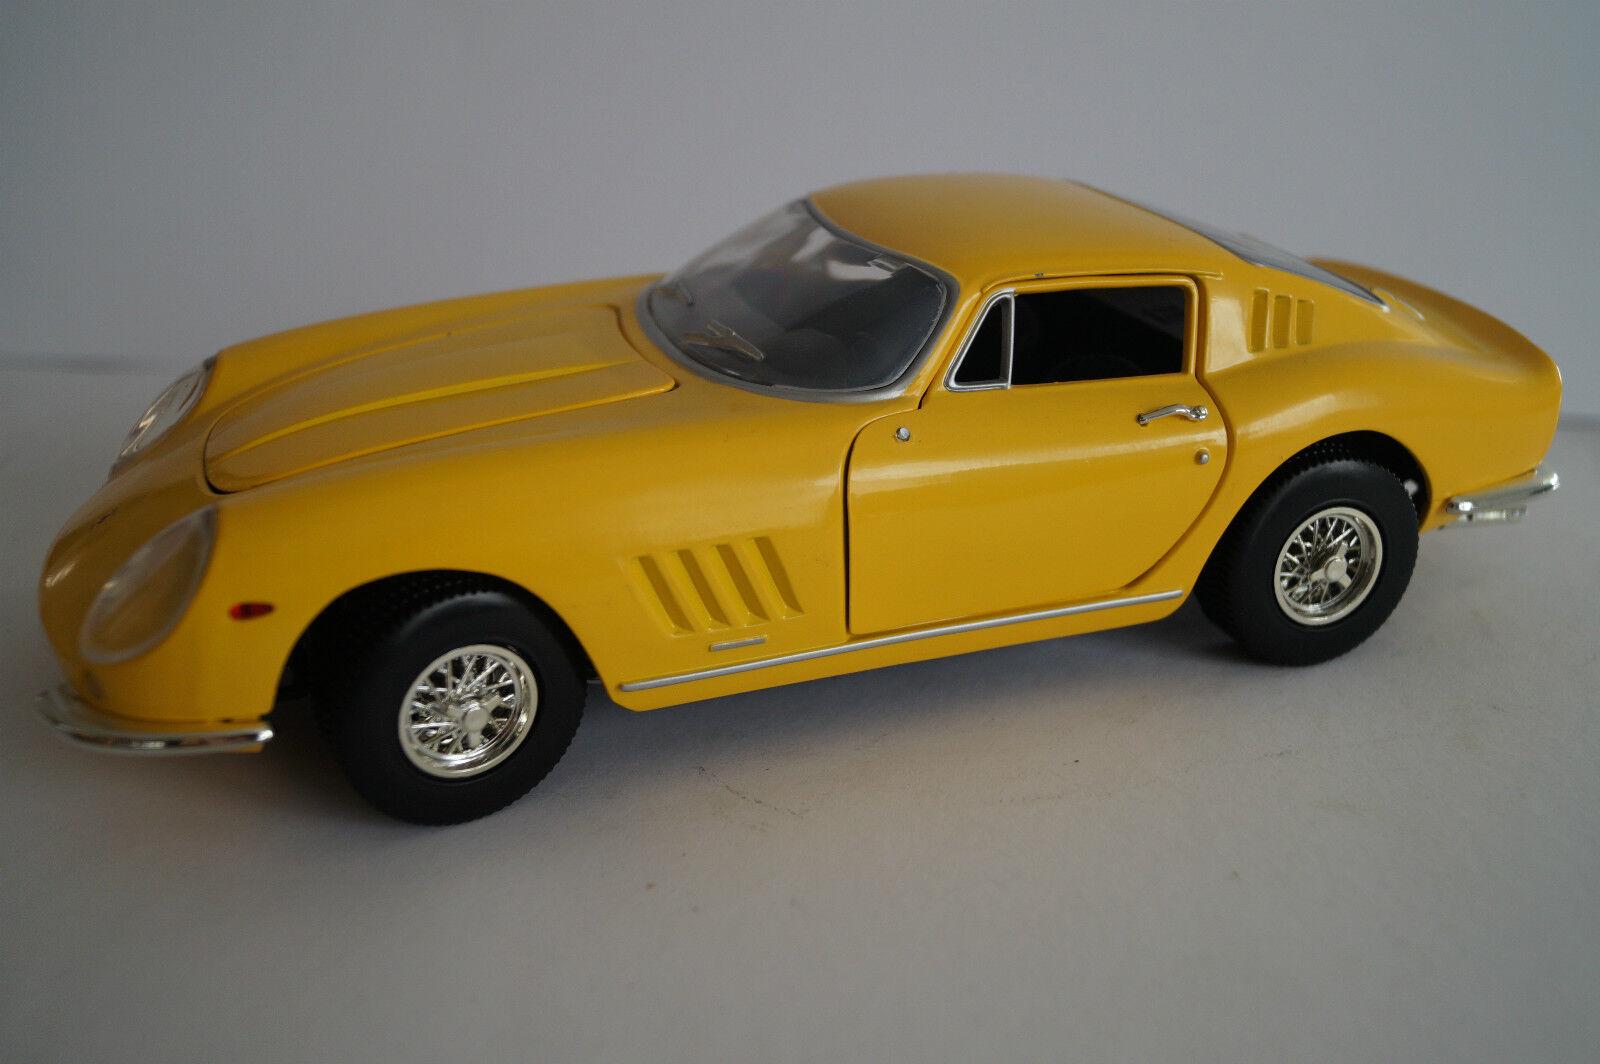 Ertl coche modelo ferrari 1 18 gtb-4 1966